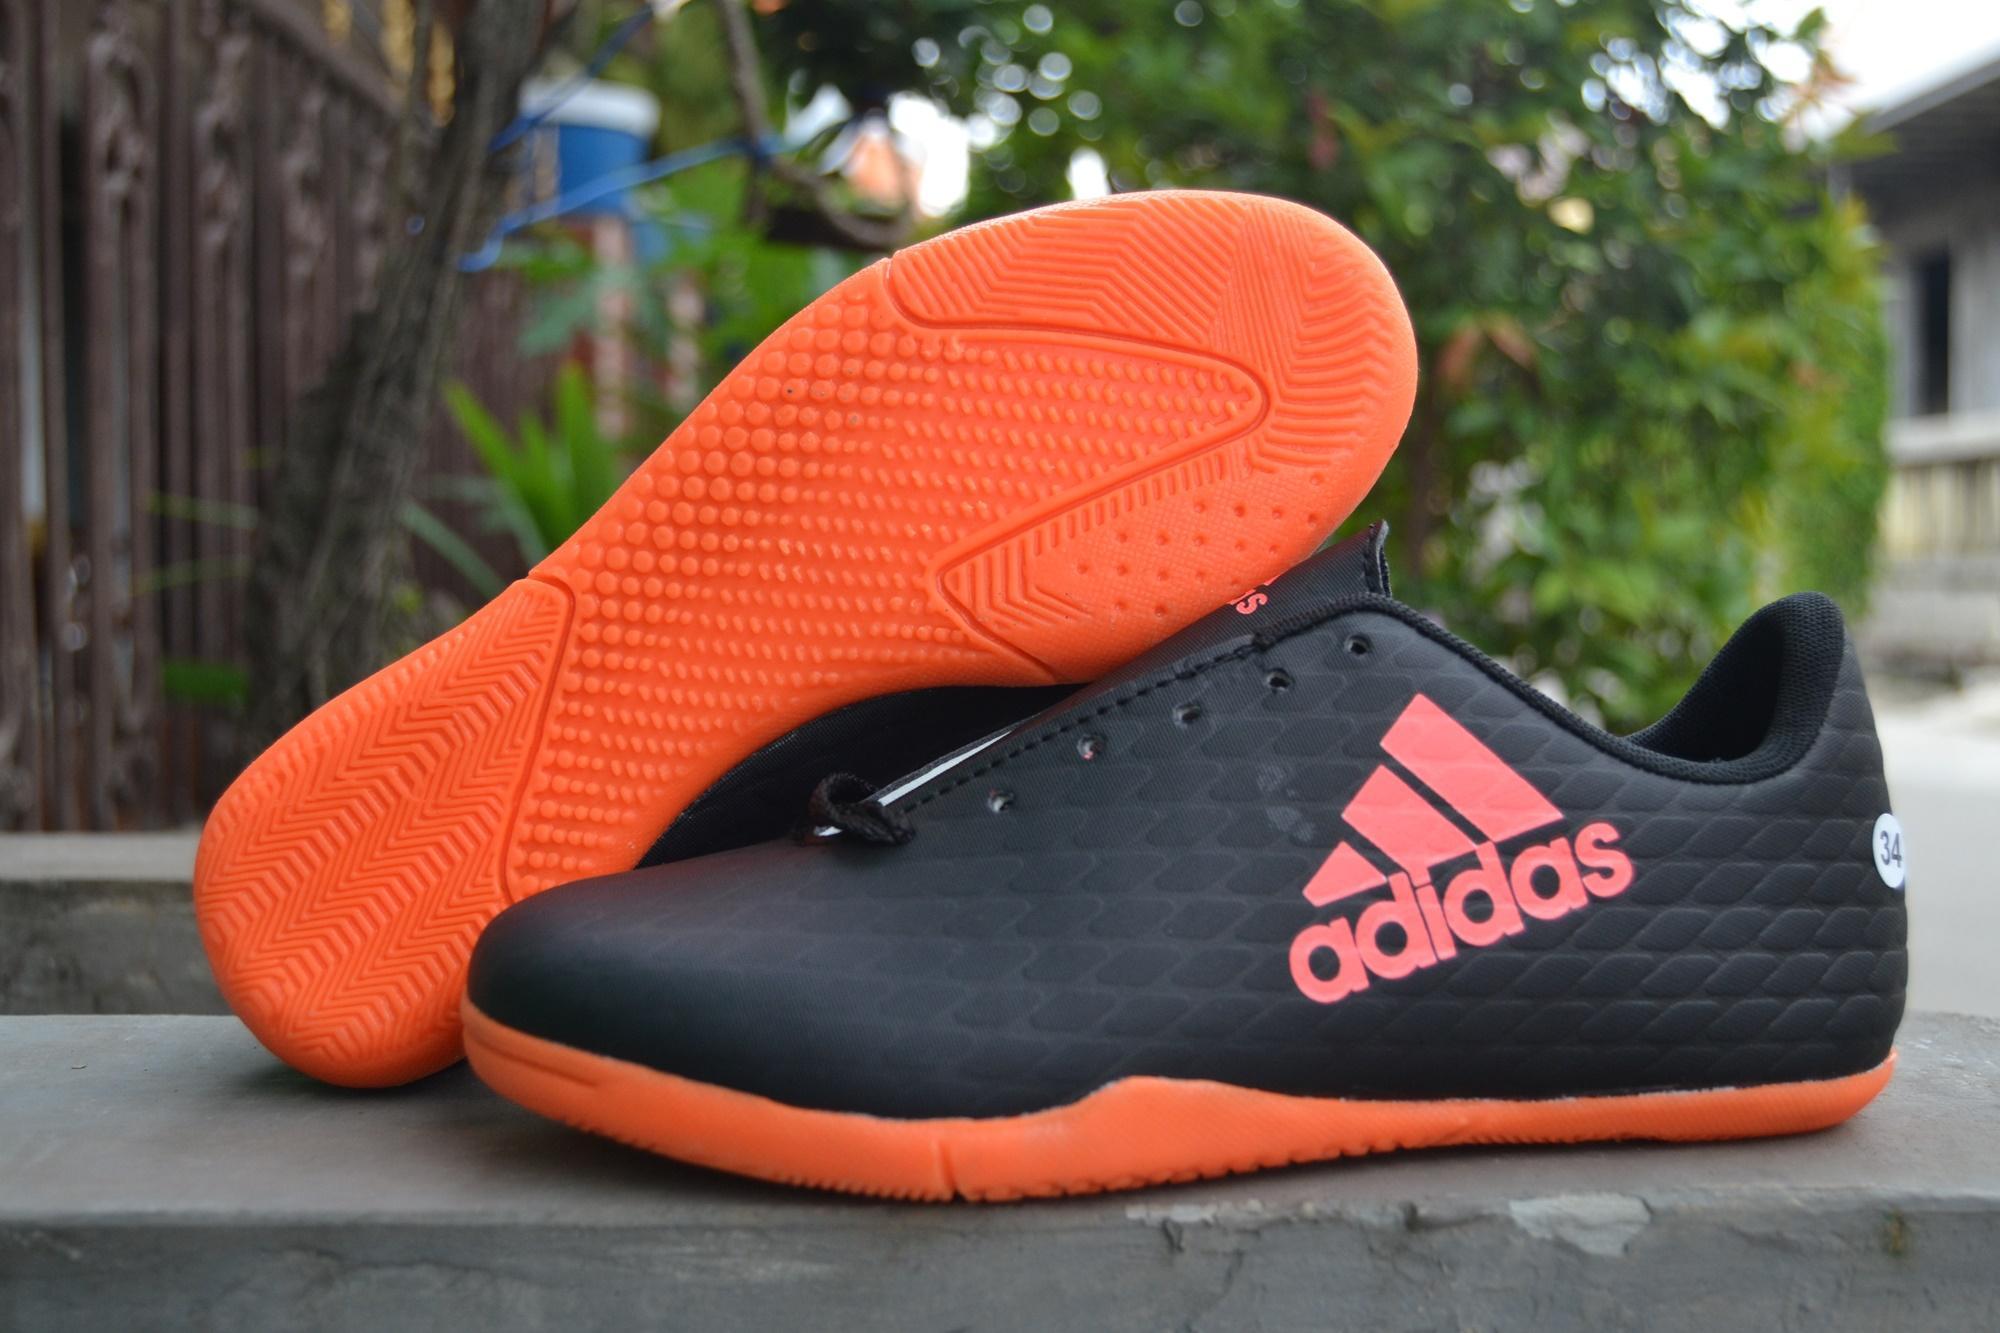 sepatu futsal anak - sepatu olahraga anak - sepatu futsal anak sd-smp bcc75b2ca2